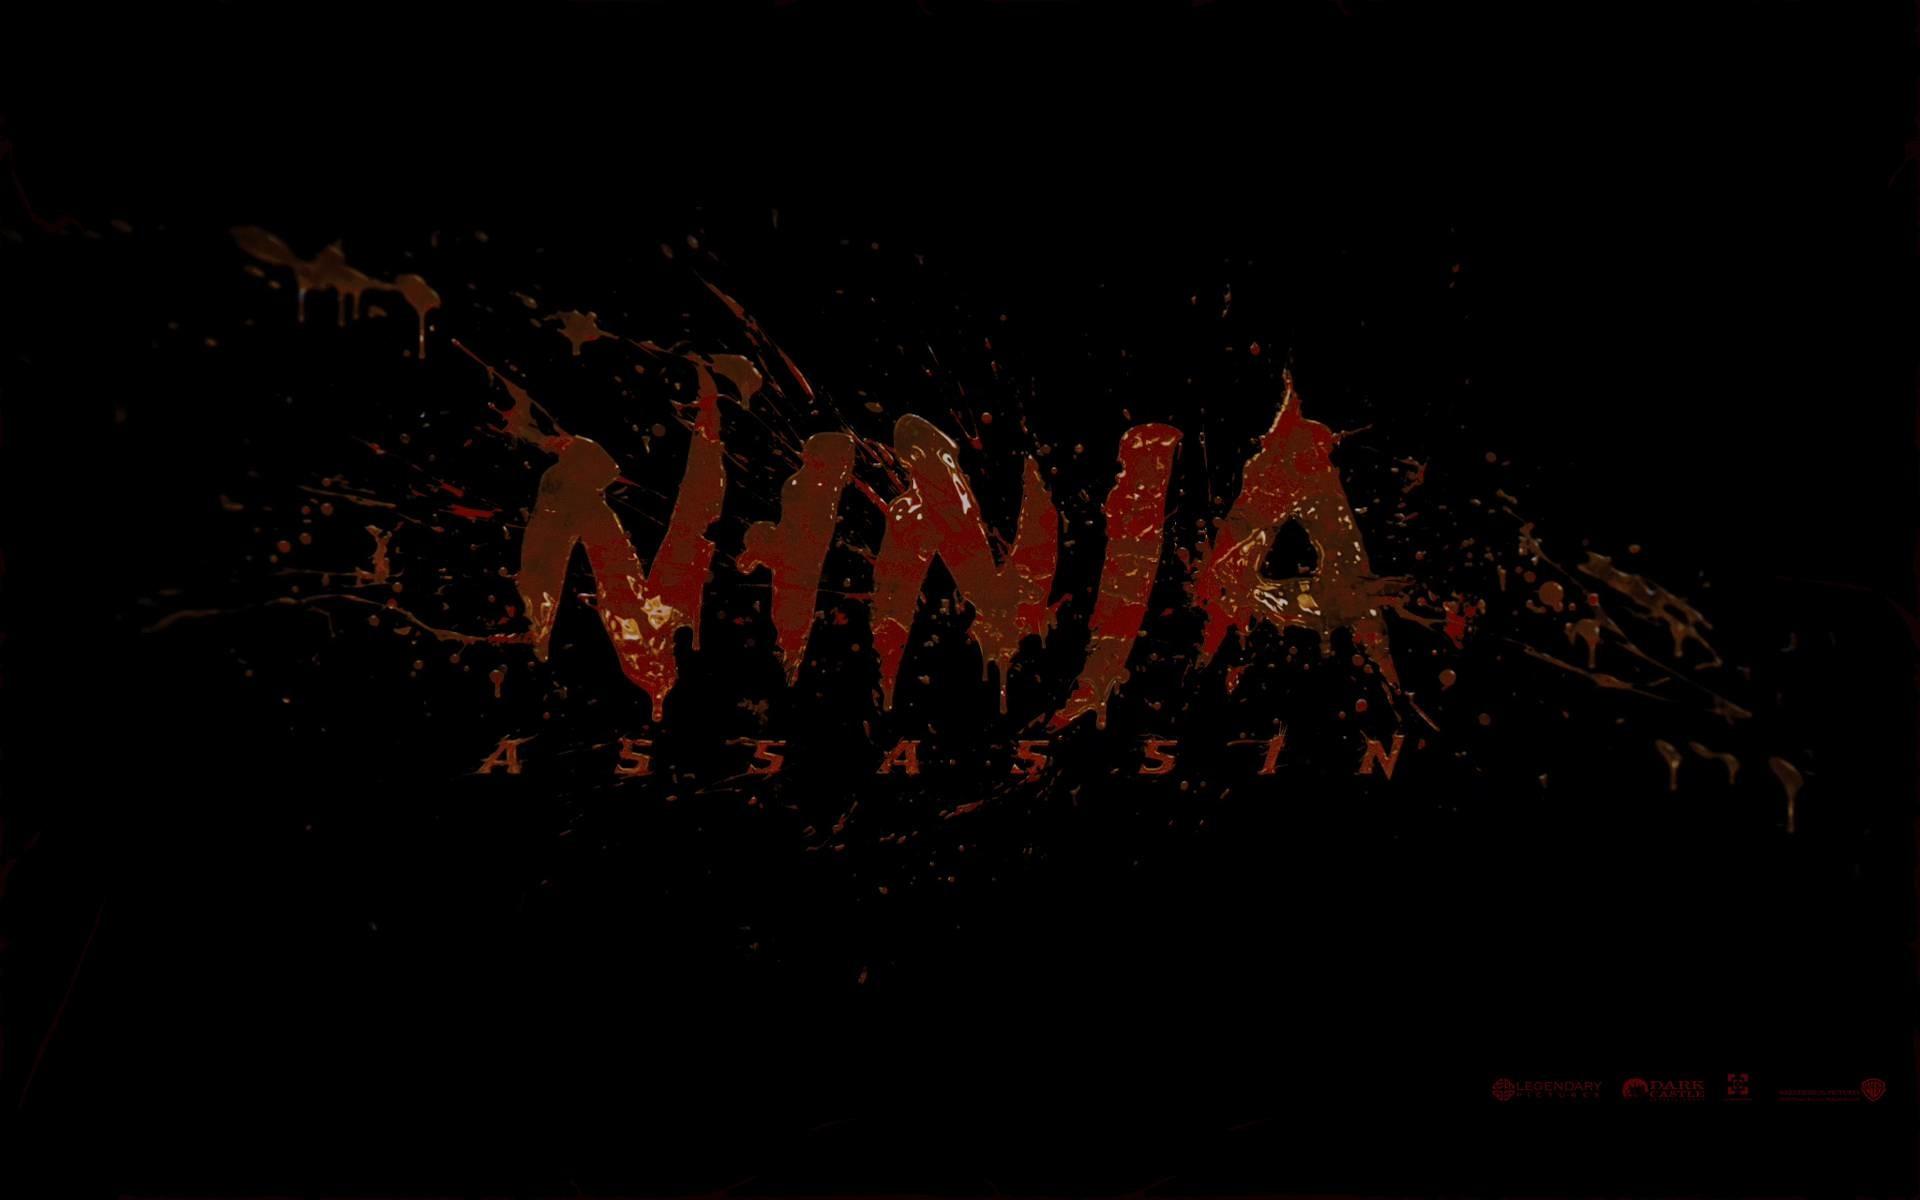 Ninja Assassin Wallpapers – Full HD wallpaper search